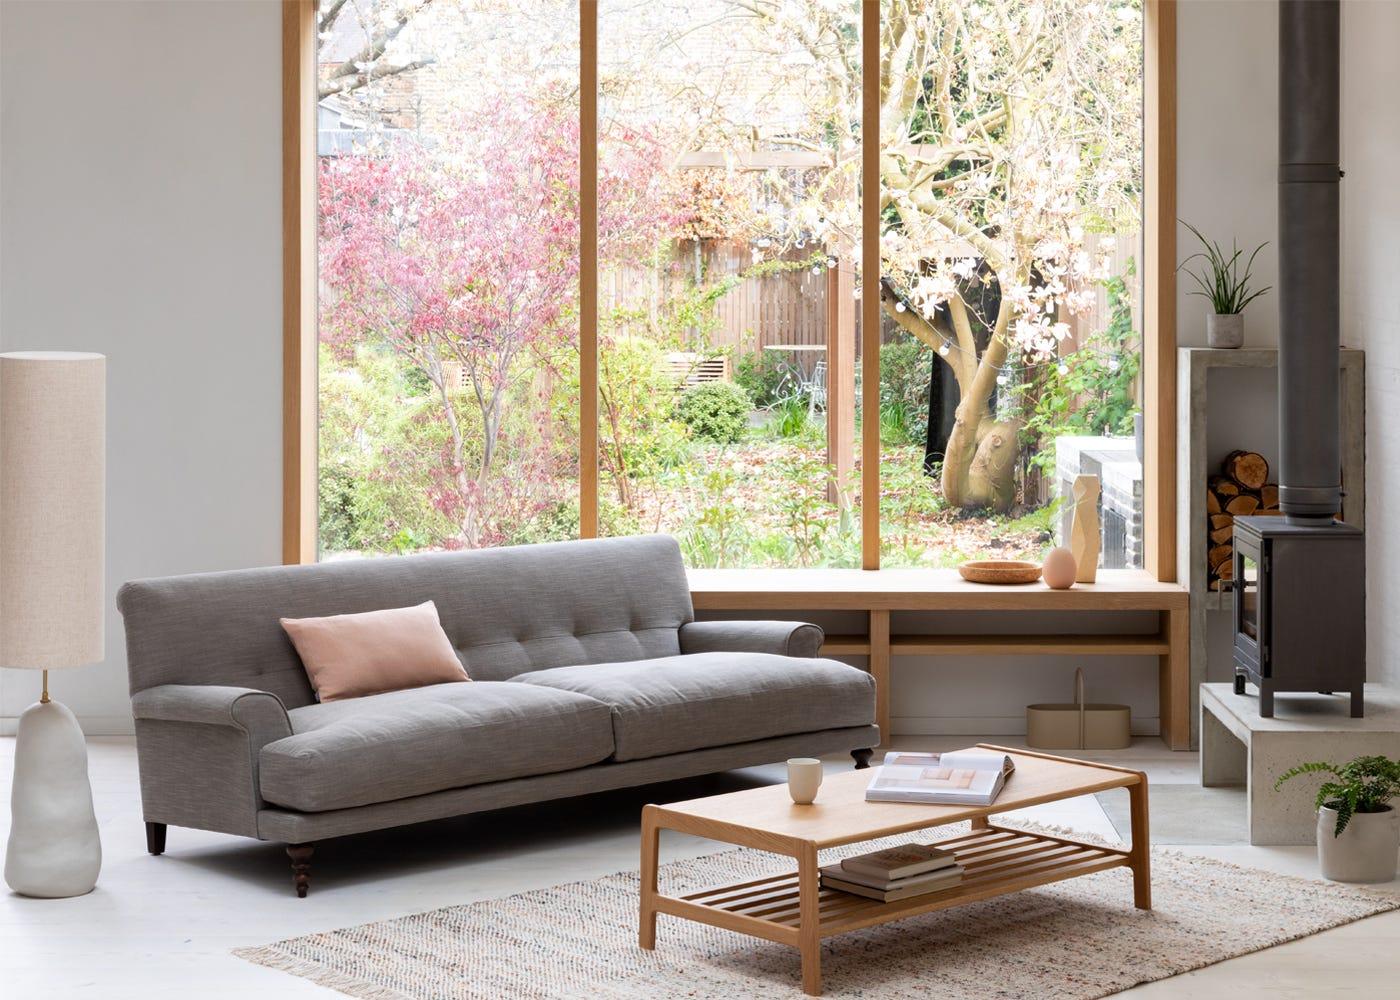 Oscar Formal 3 Seater Sofa in Broad Weave Pebble